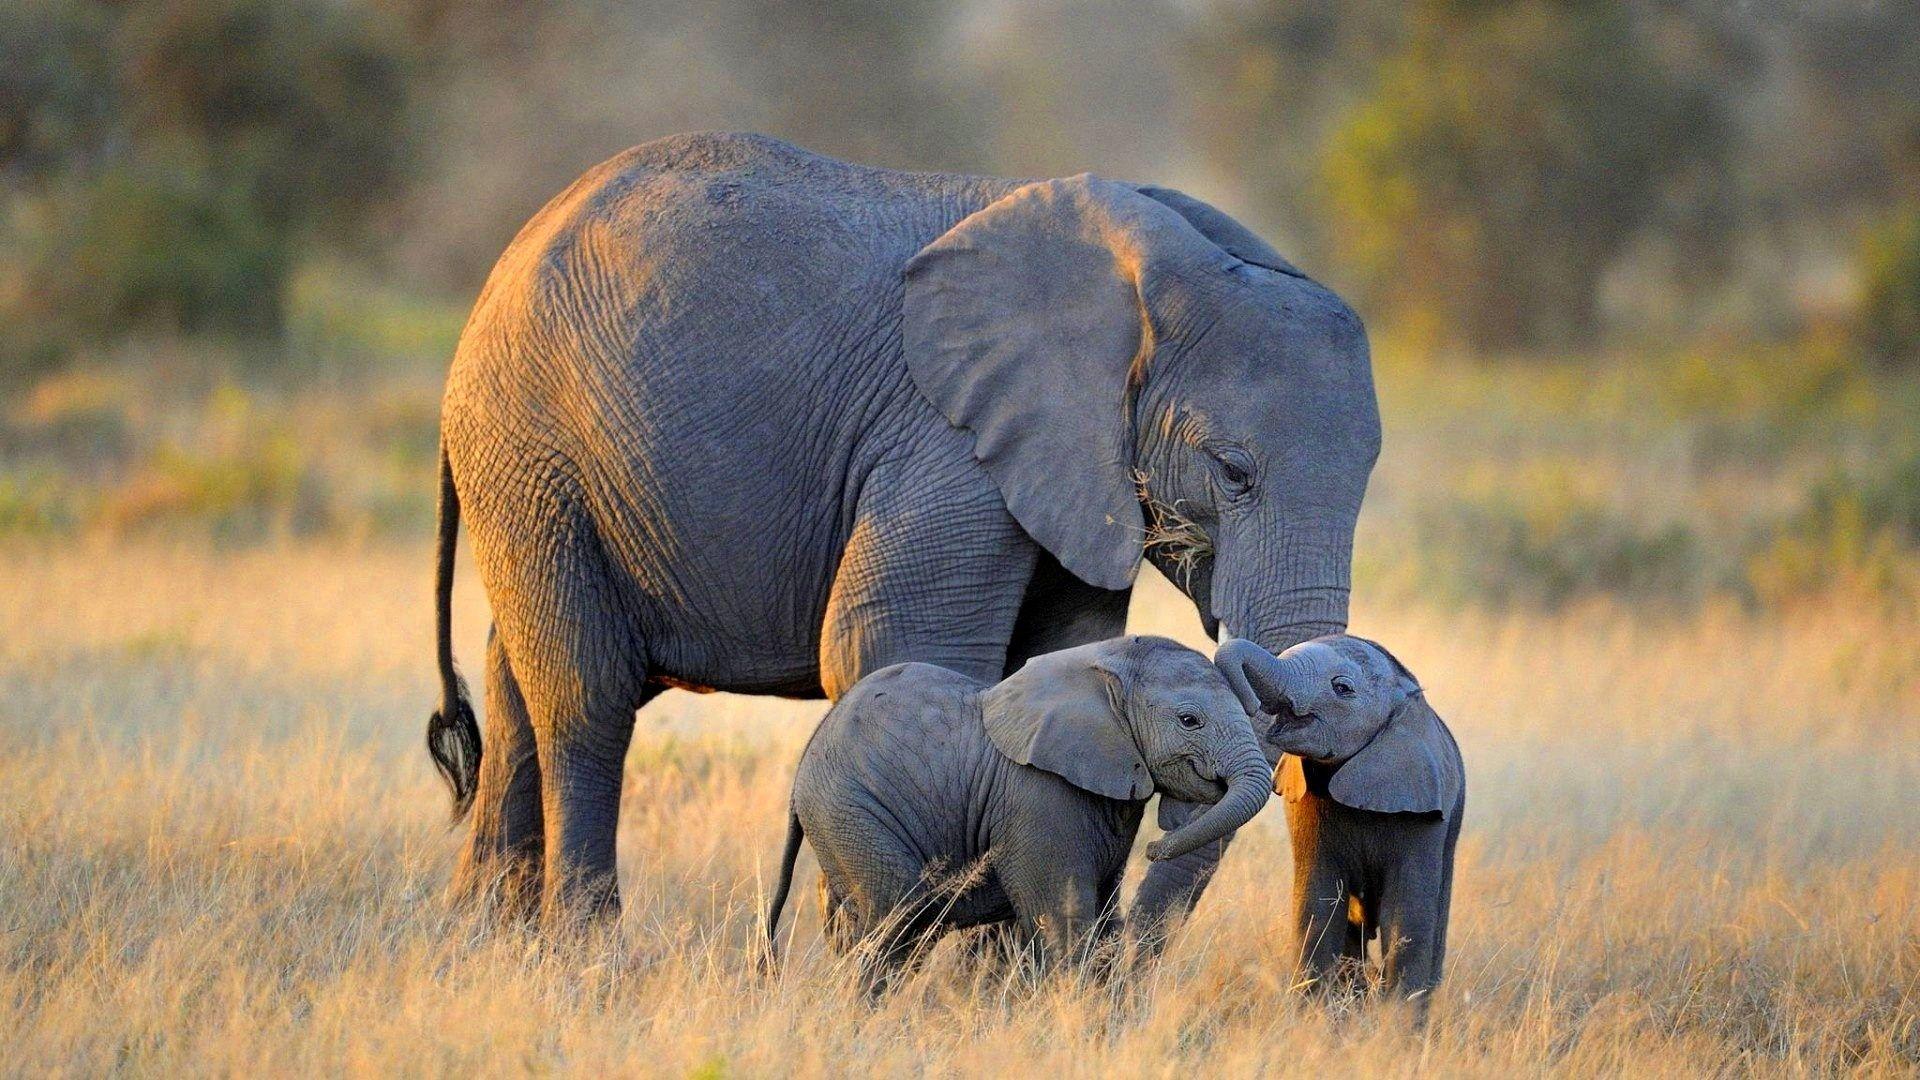 Hd wallpaper elephant - Hd Wallpaper Elephant 47